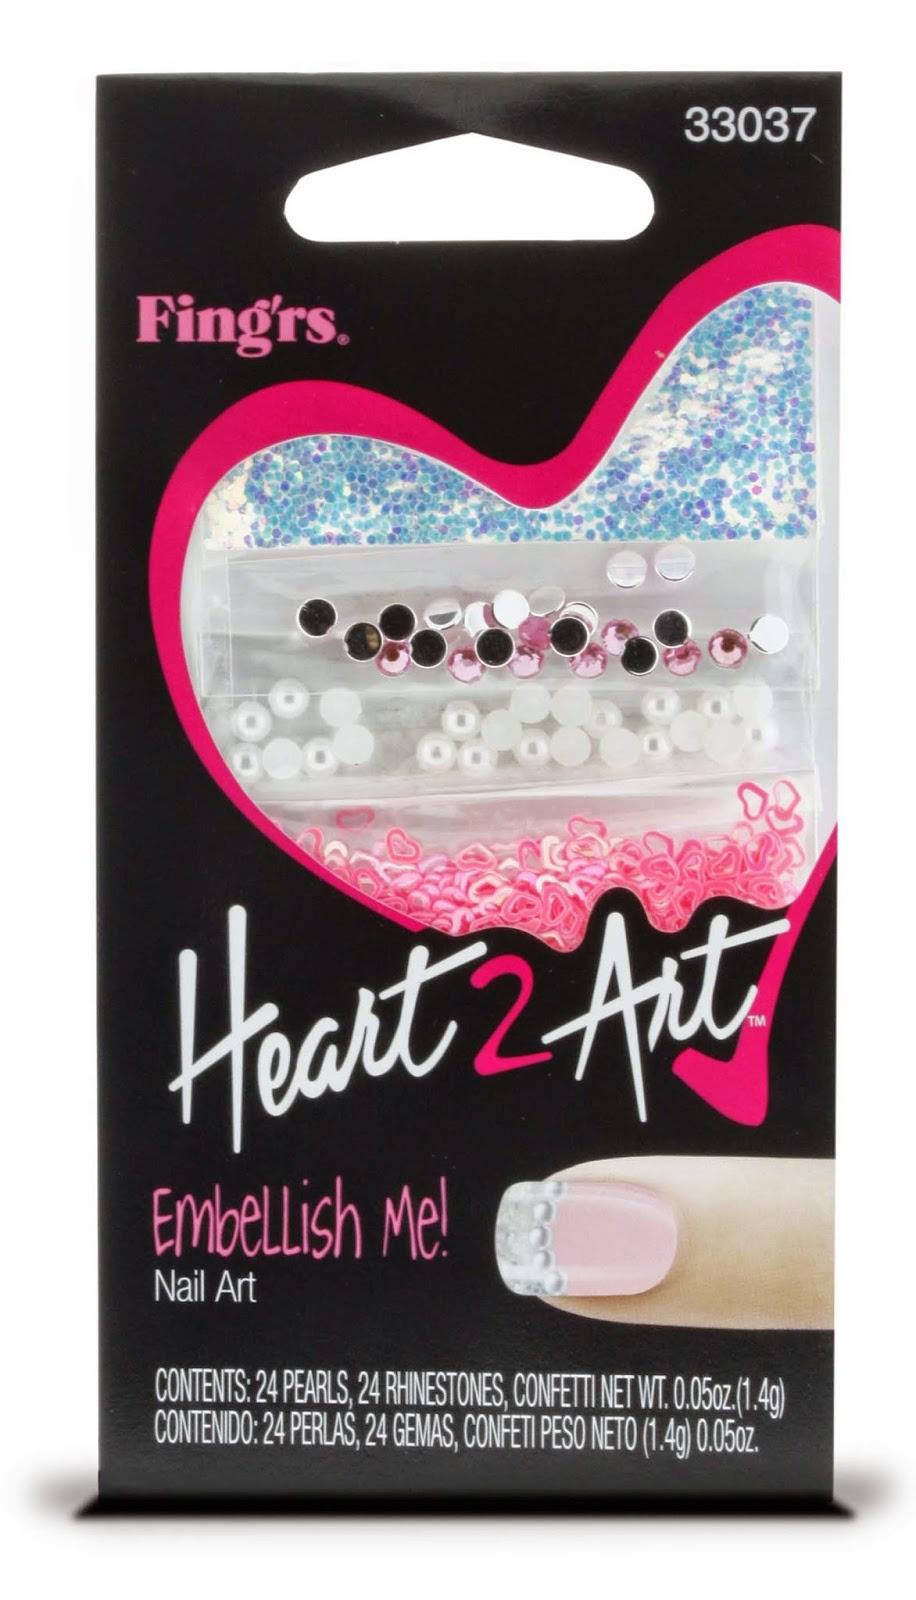 Heart2Art - Embellish Me!